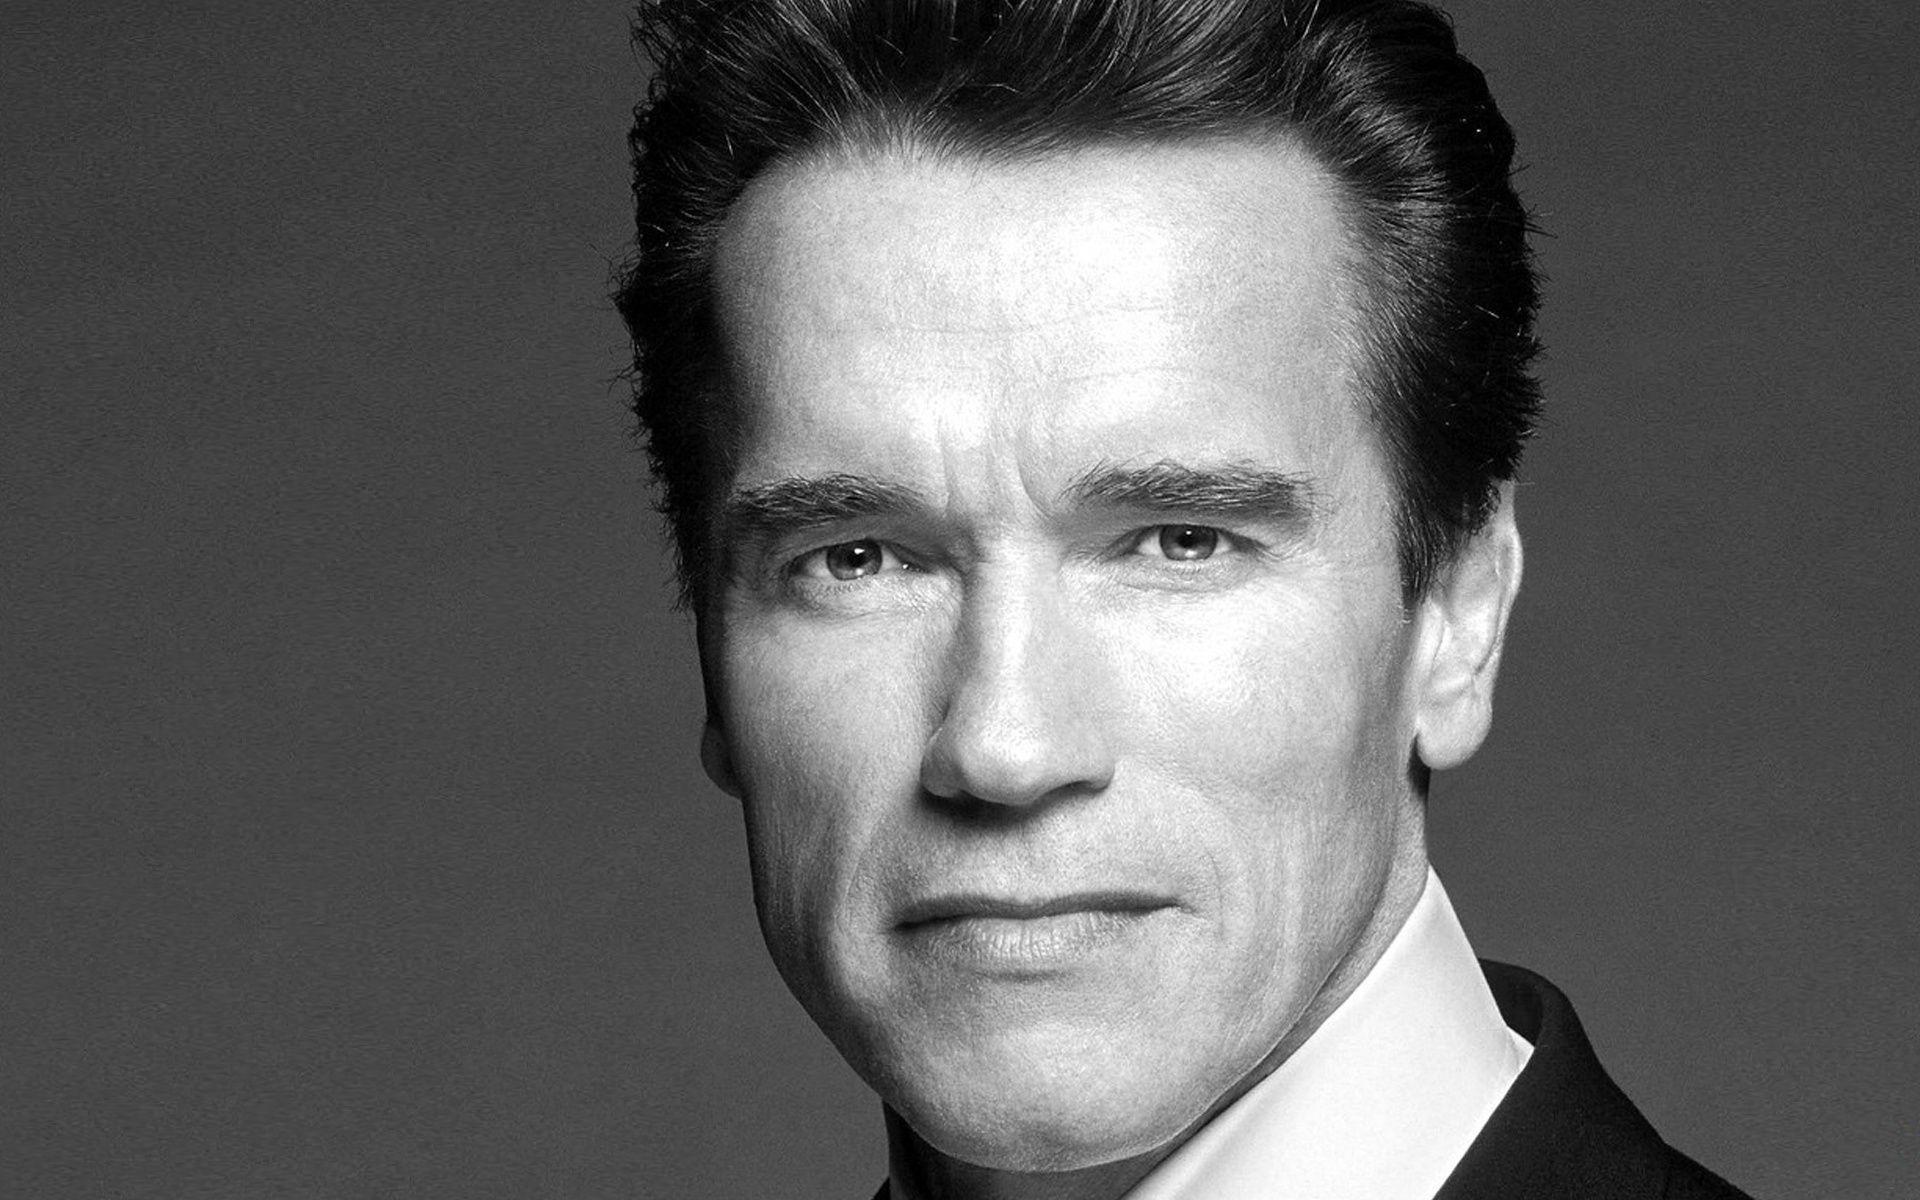 F2a9759c09c2104853bd9f5b8016eee3 Large Jpeg 1920 1200 With Images Arnold Schwarzenegger Schwarzenegger Arnold